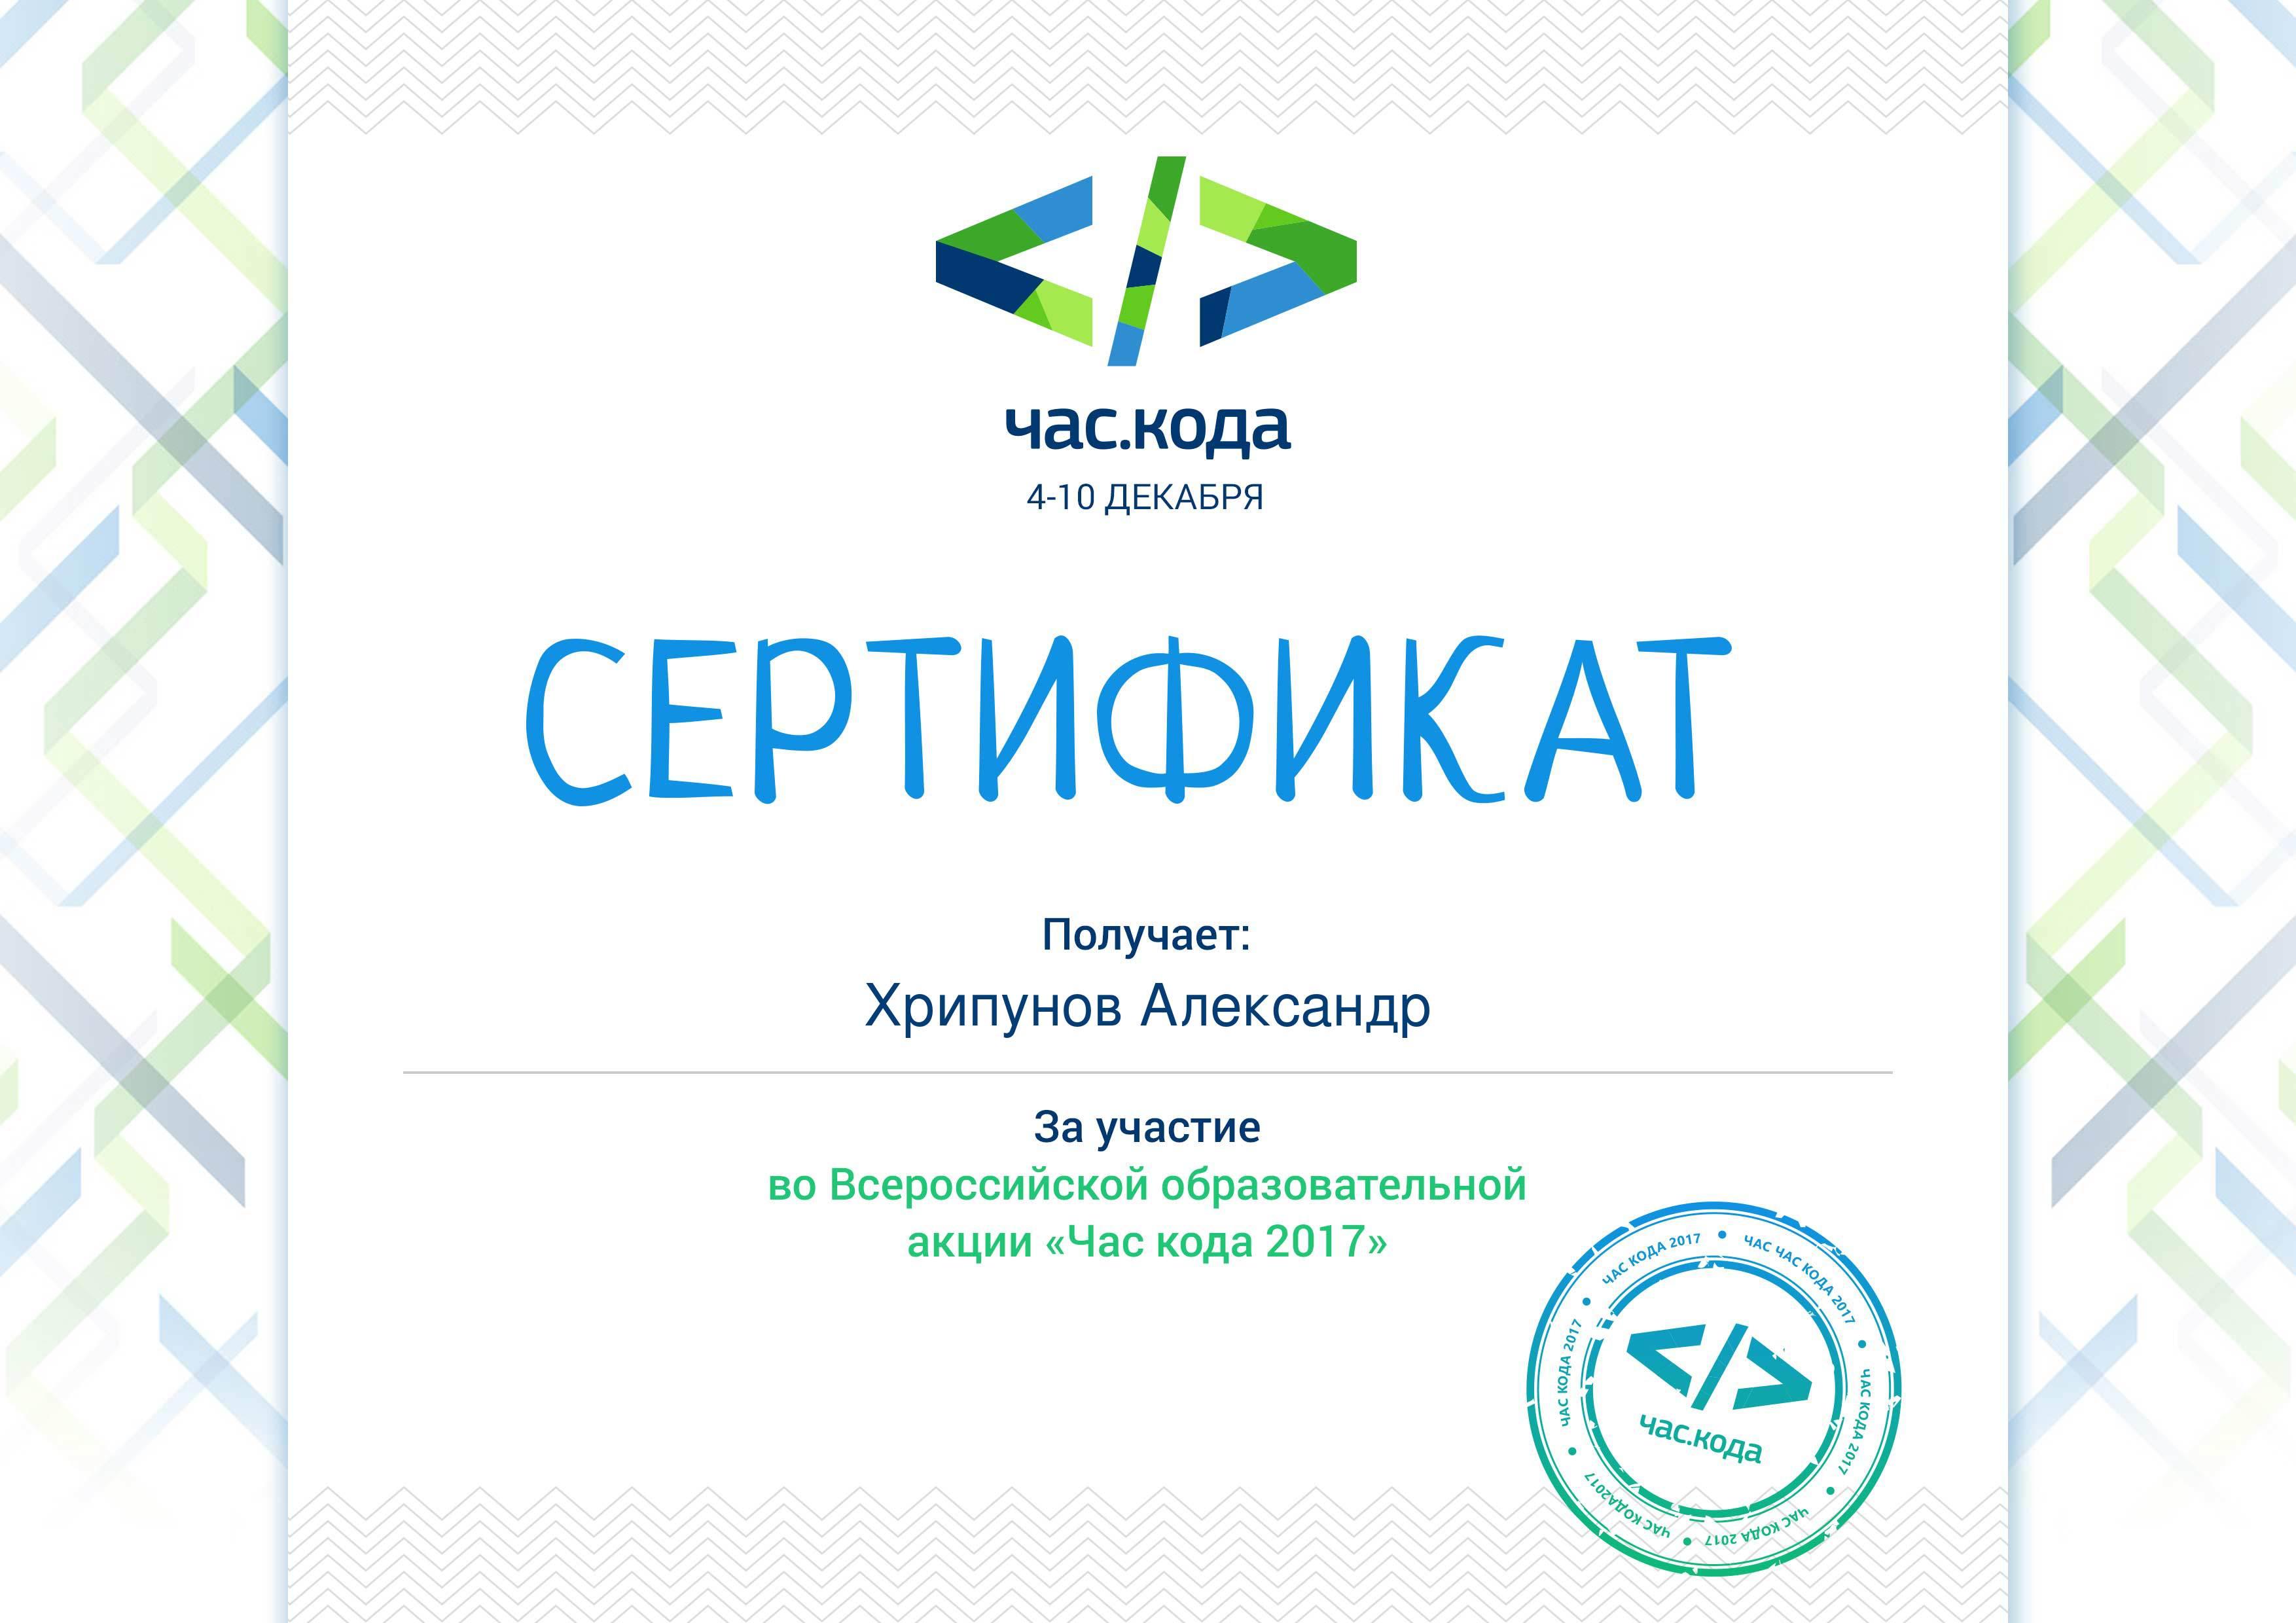 Khripunov_Alieksandr.jpg